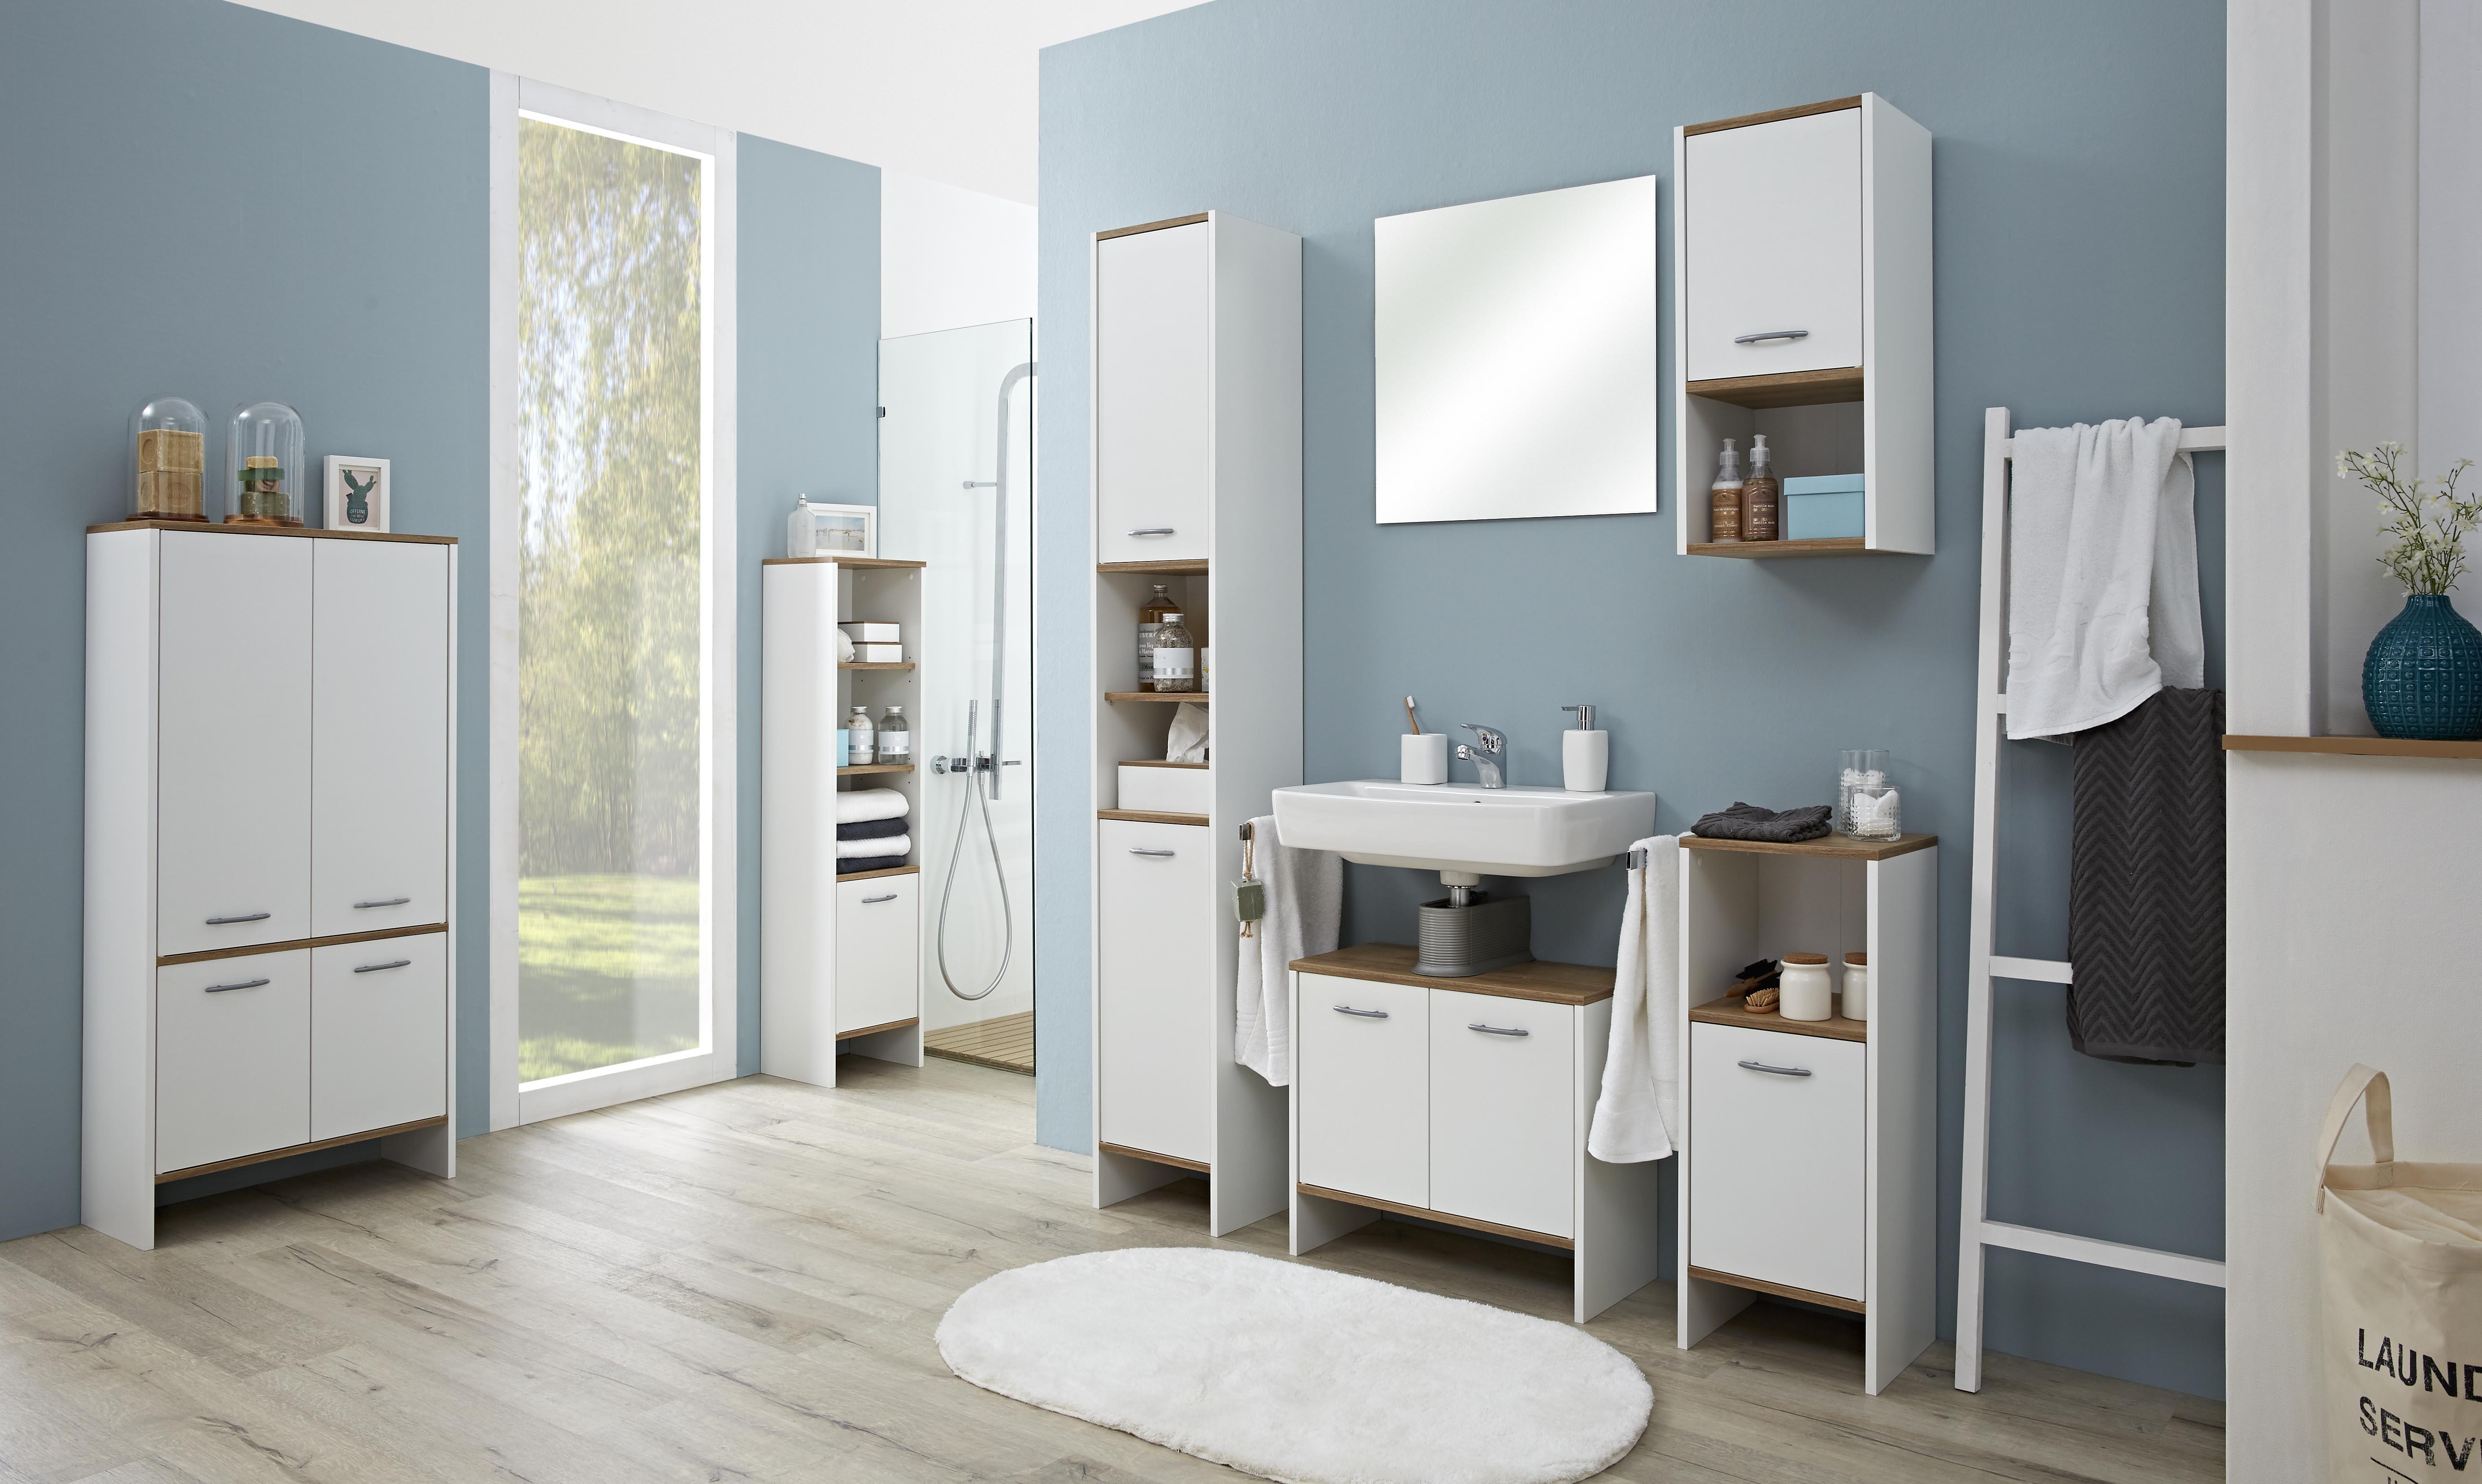 6a2f91cdff7 SINA VALGE / TAMM, vannitoamööbel, mööbel, mööbli müük - Gardening OÜ